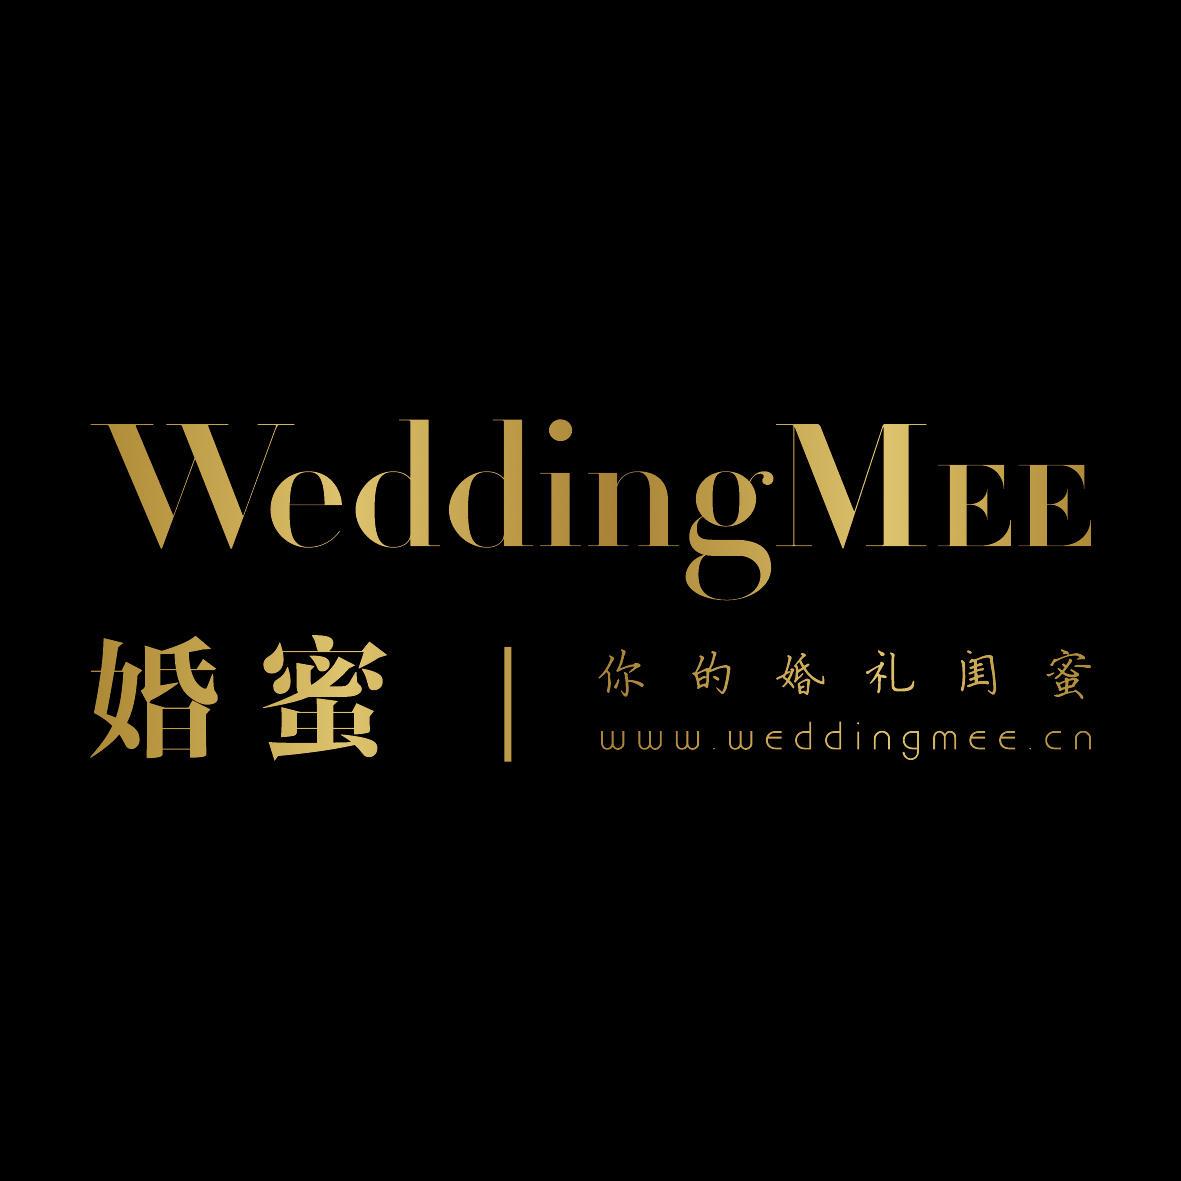 WeddingMEE婚蜜澳门金沙官网_官方网站